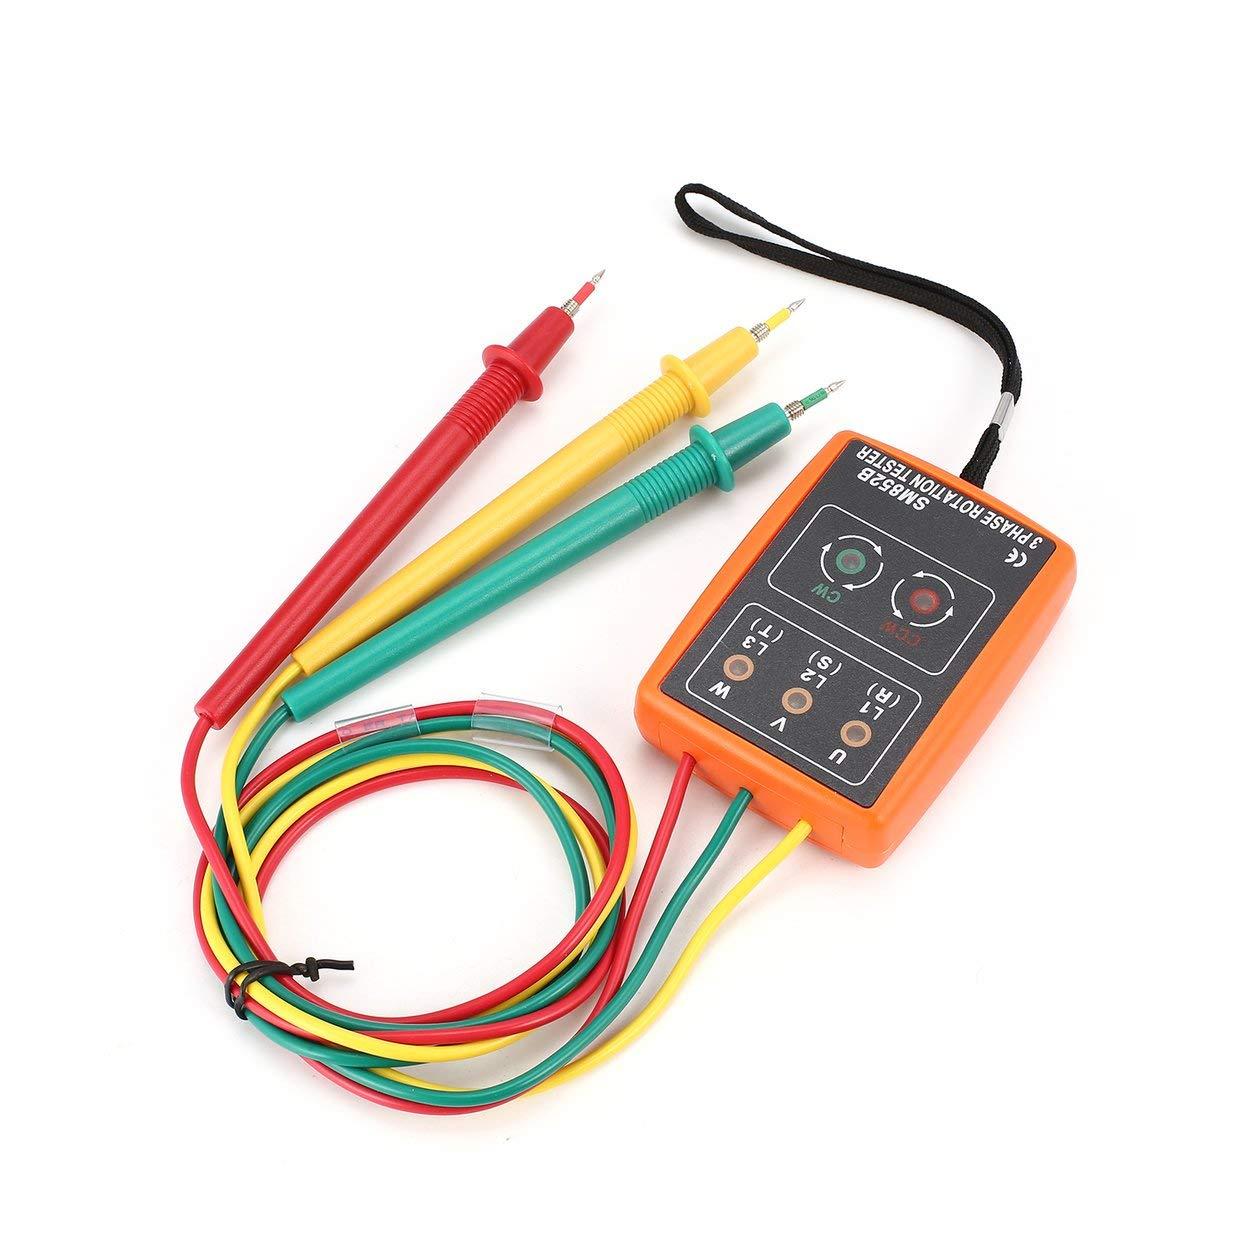 Tree-on-Life SM852B Probador de rotaci/ón trif/ásico Detector de fase digital LED Zumbador Medidor de secuencia de fase Probador de voltaje 60V ~ 600V AC